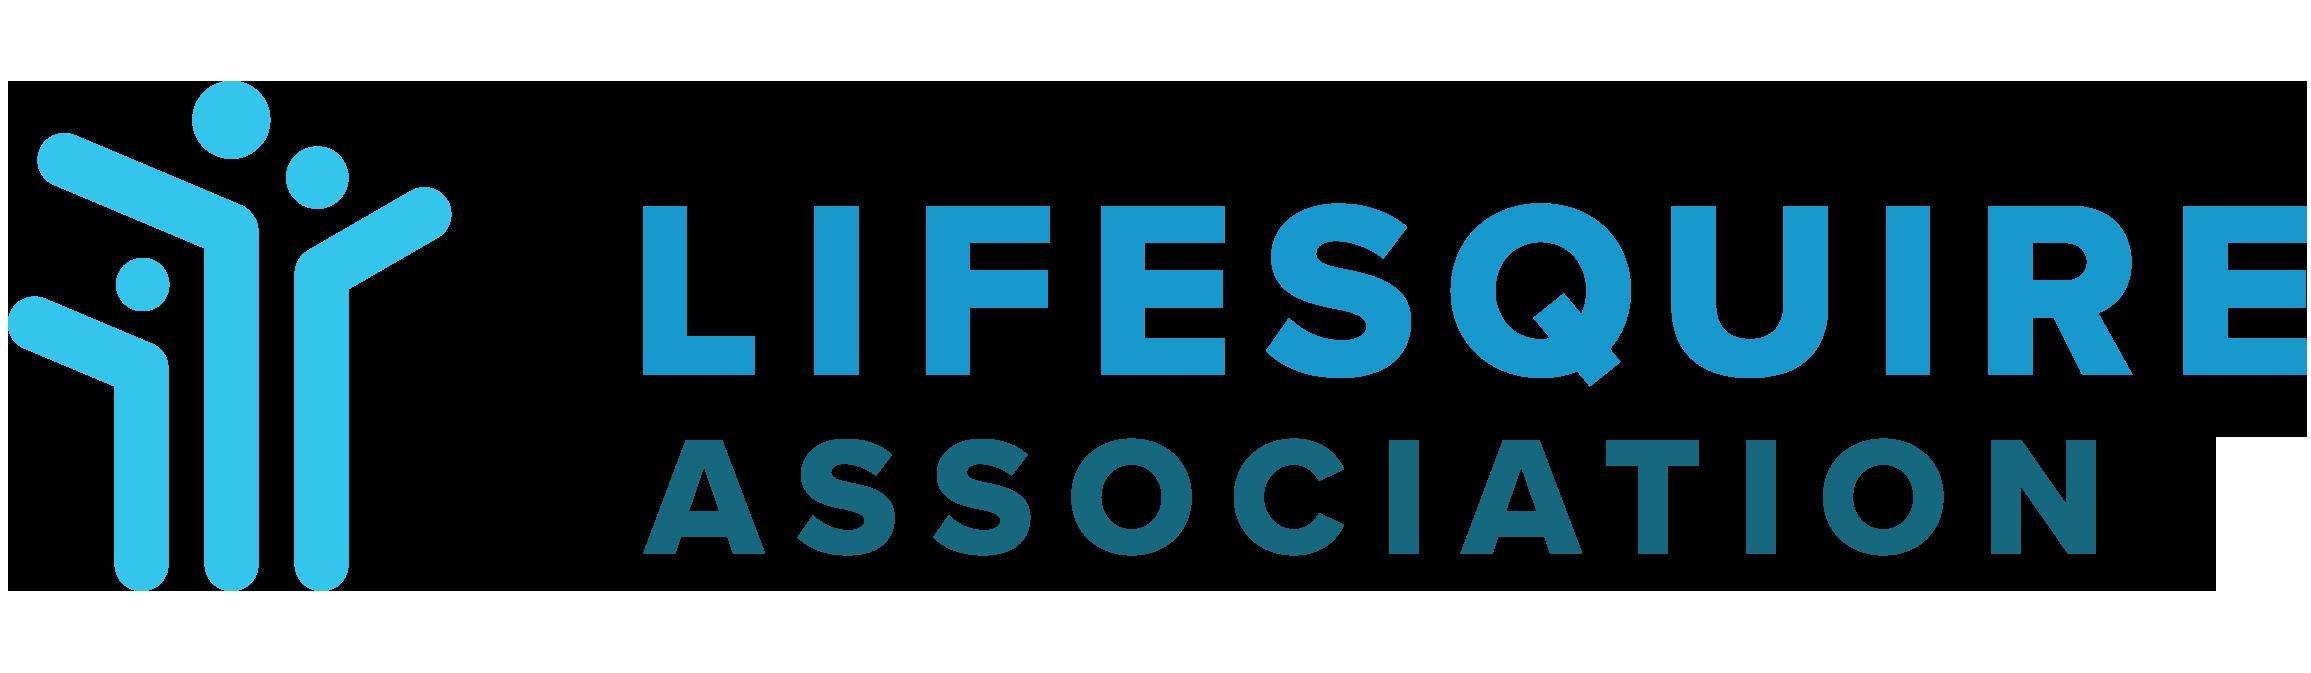 lifesquire-association_full-logo-1 (1).png